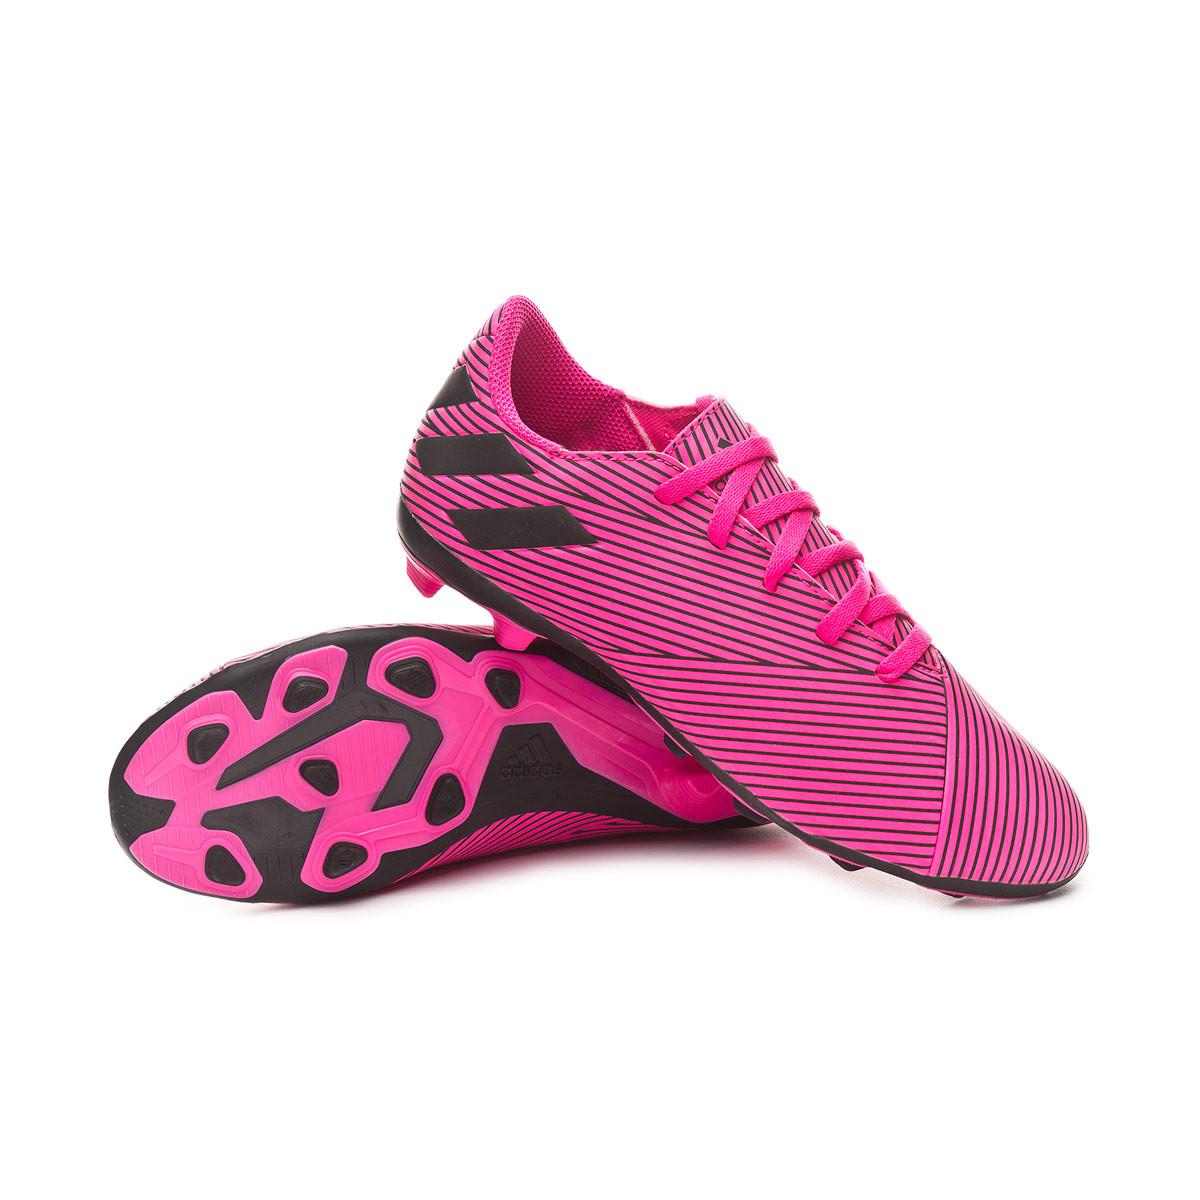 Bota Nemeziz 19.4 FxG Niño Shock pink Core black Shock pink